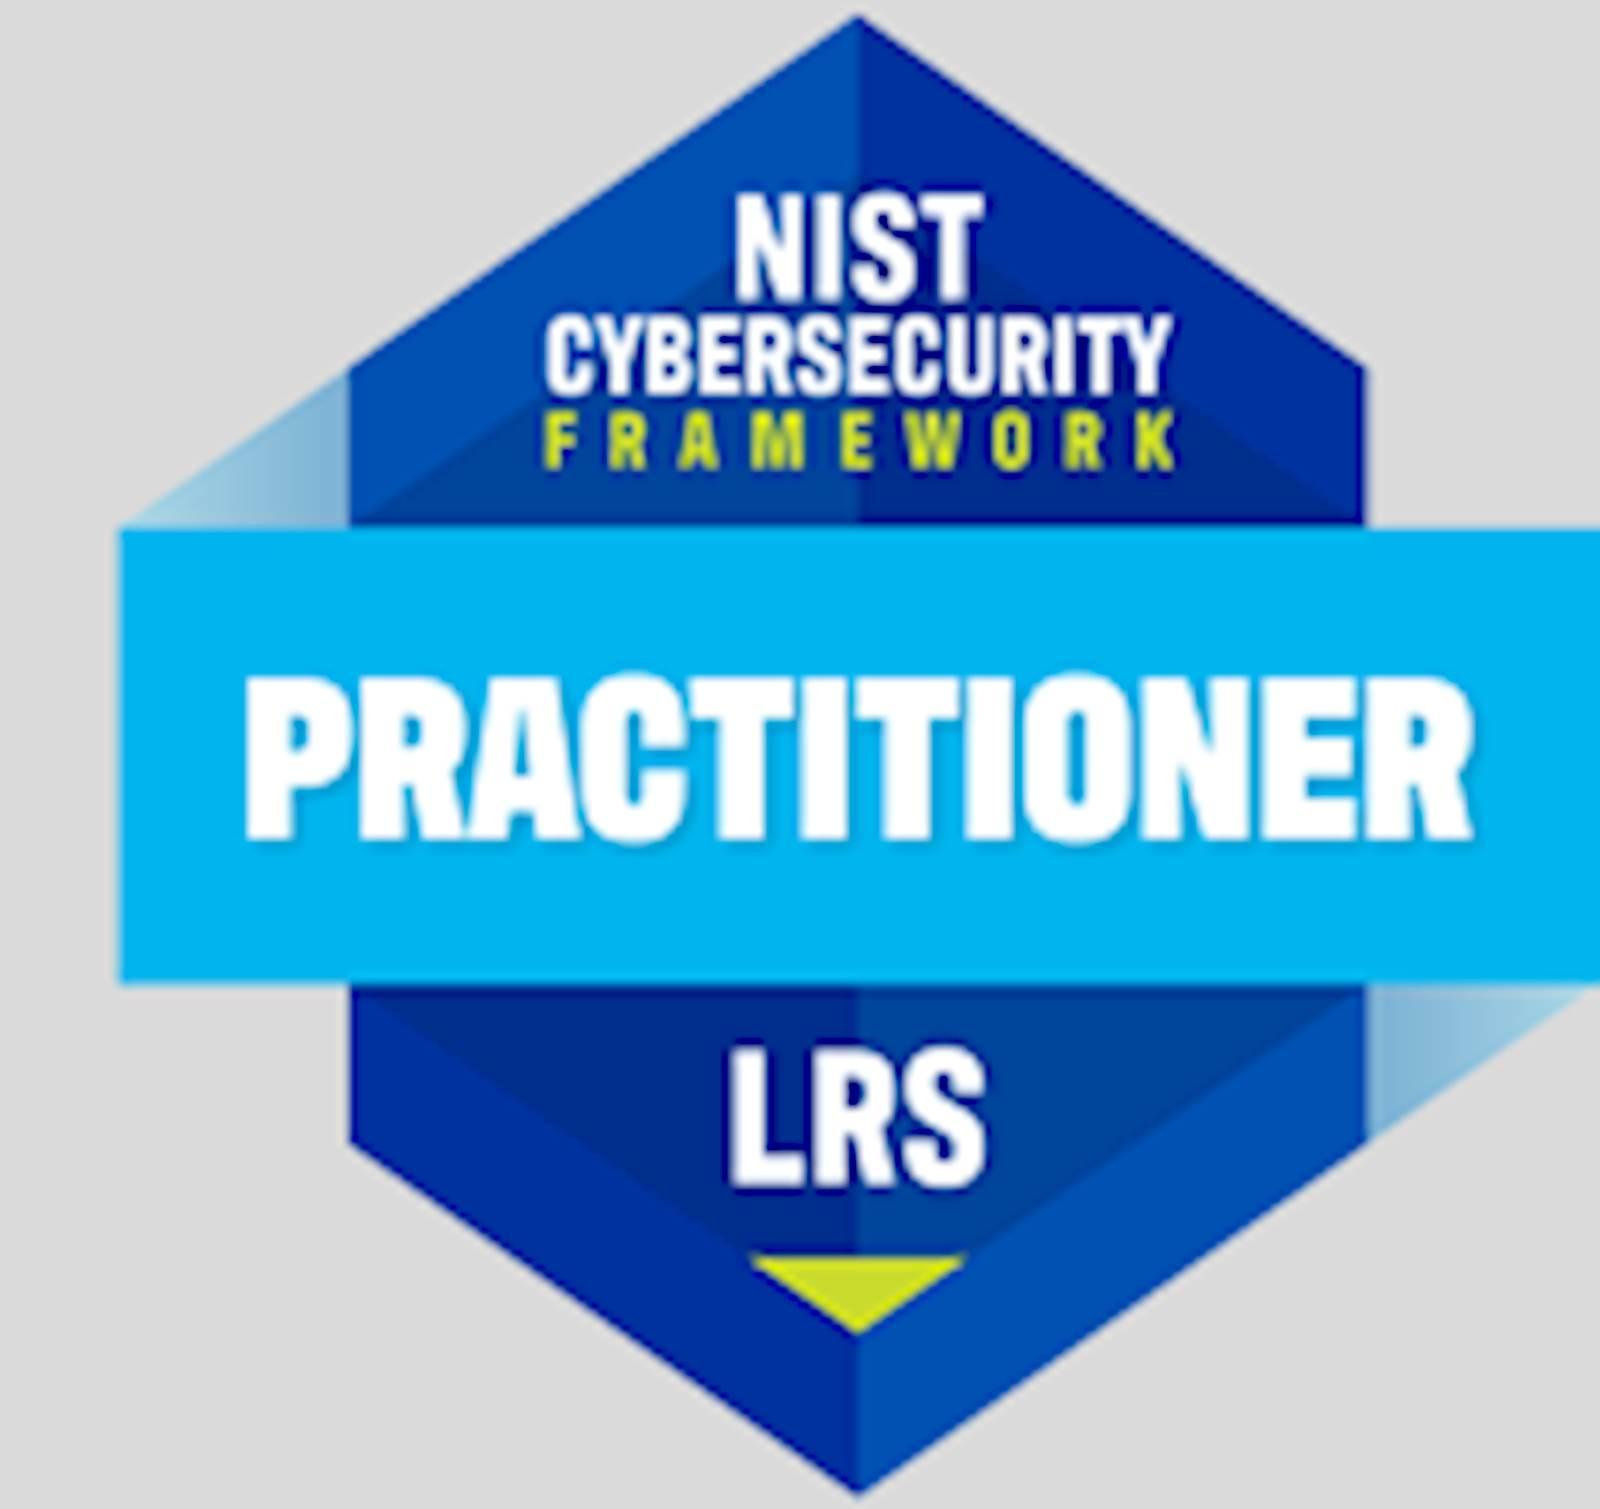 NIST Cyber security Framework Practitioner Course Details